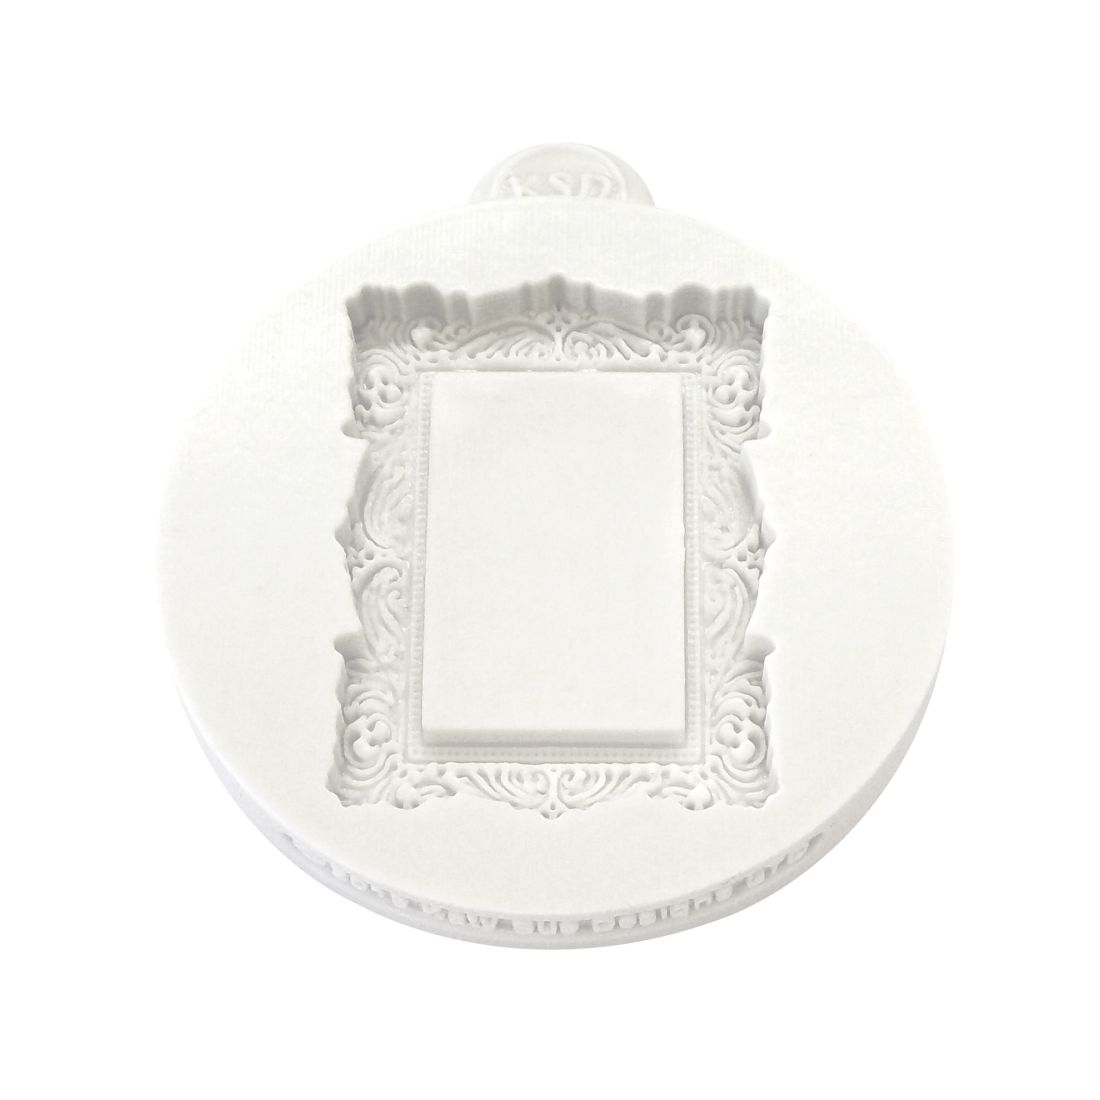 Katy Sue Miniature Frame Mould - Vintage Rectangle | Squires Kitchen ...